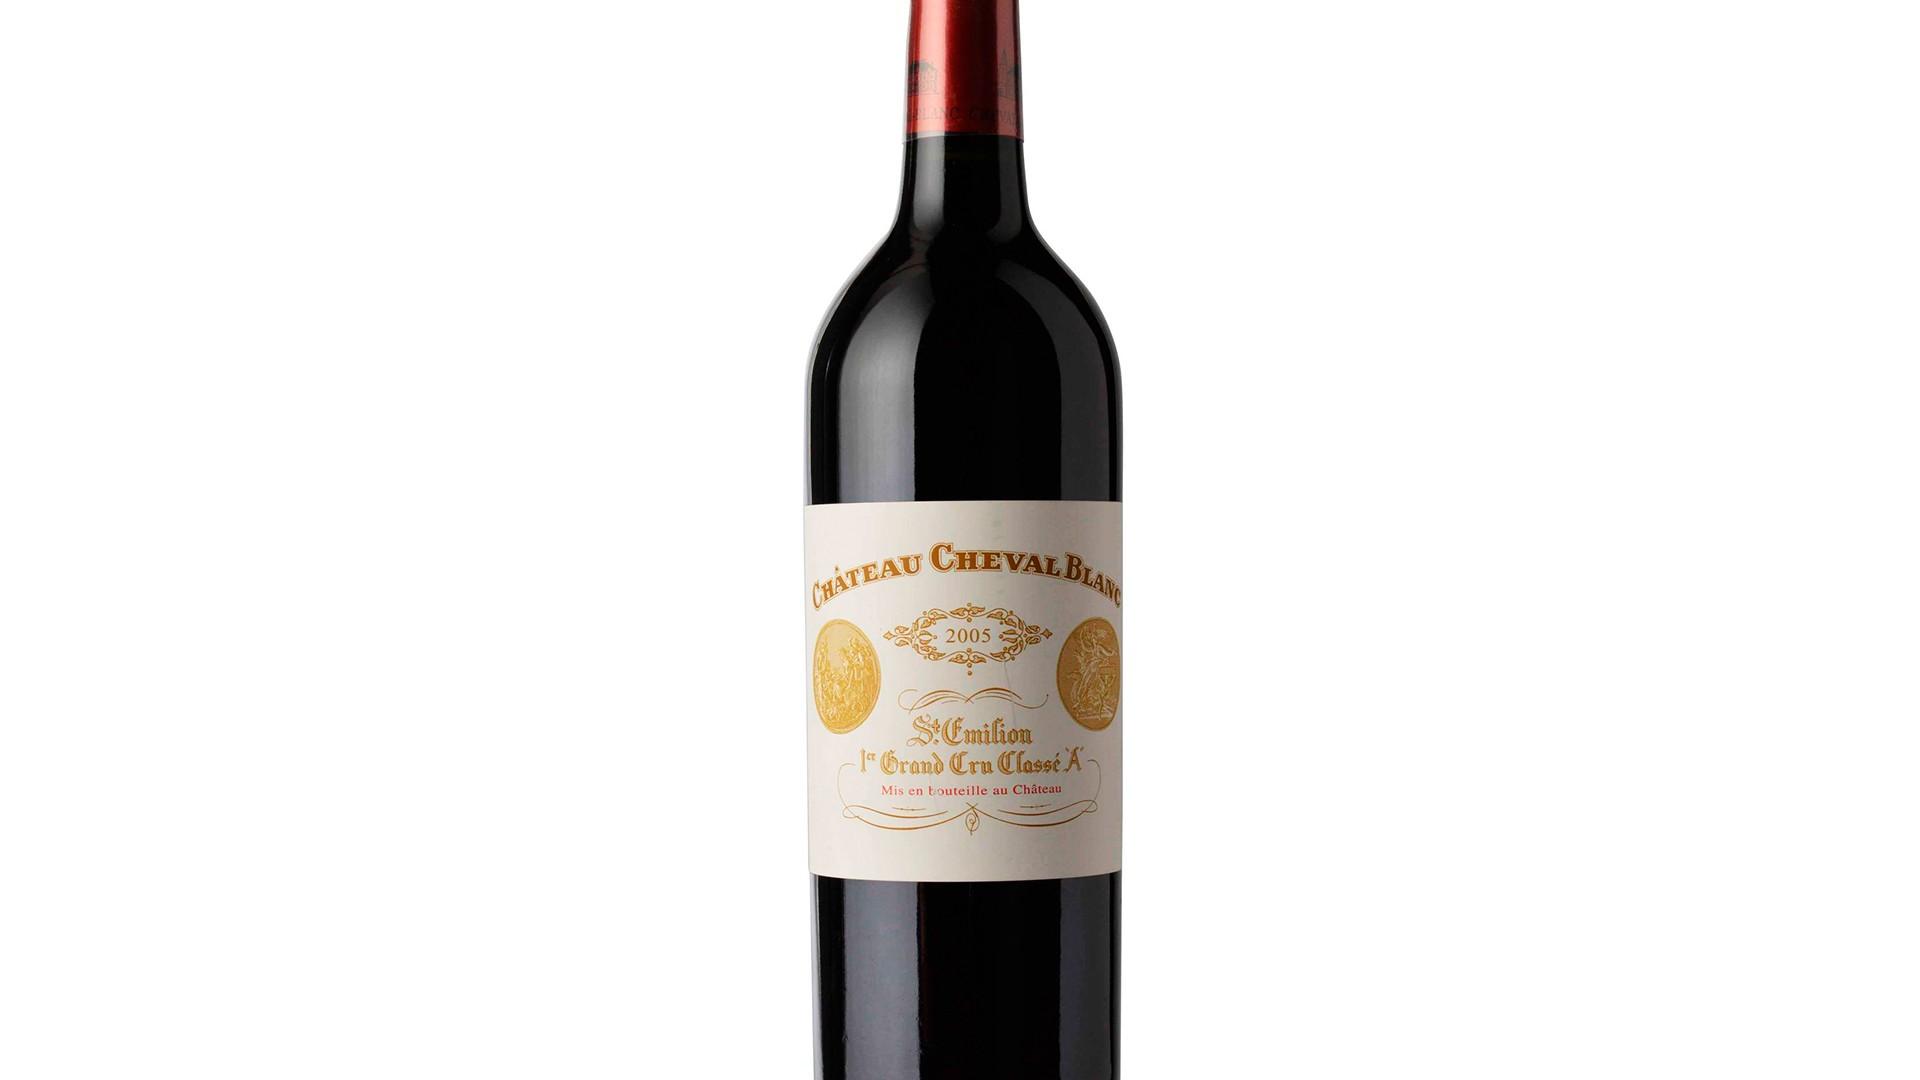 Cheval Blanc 2005